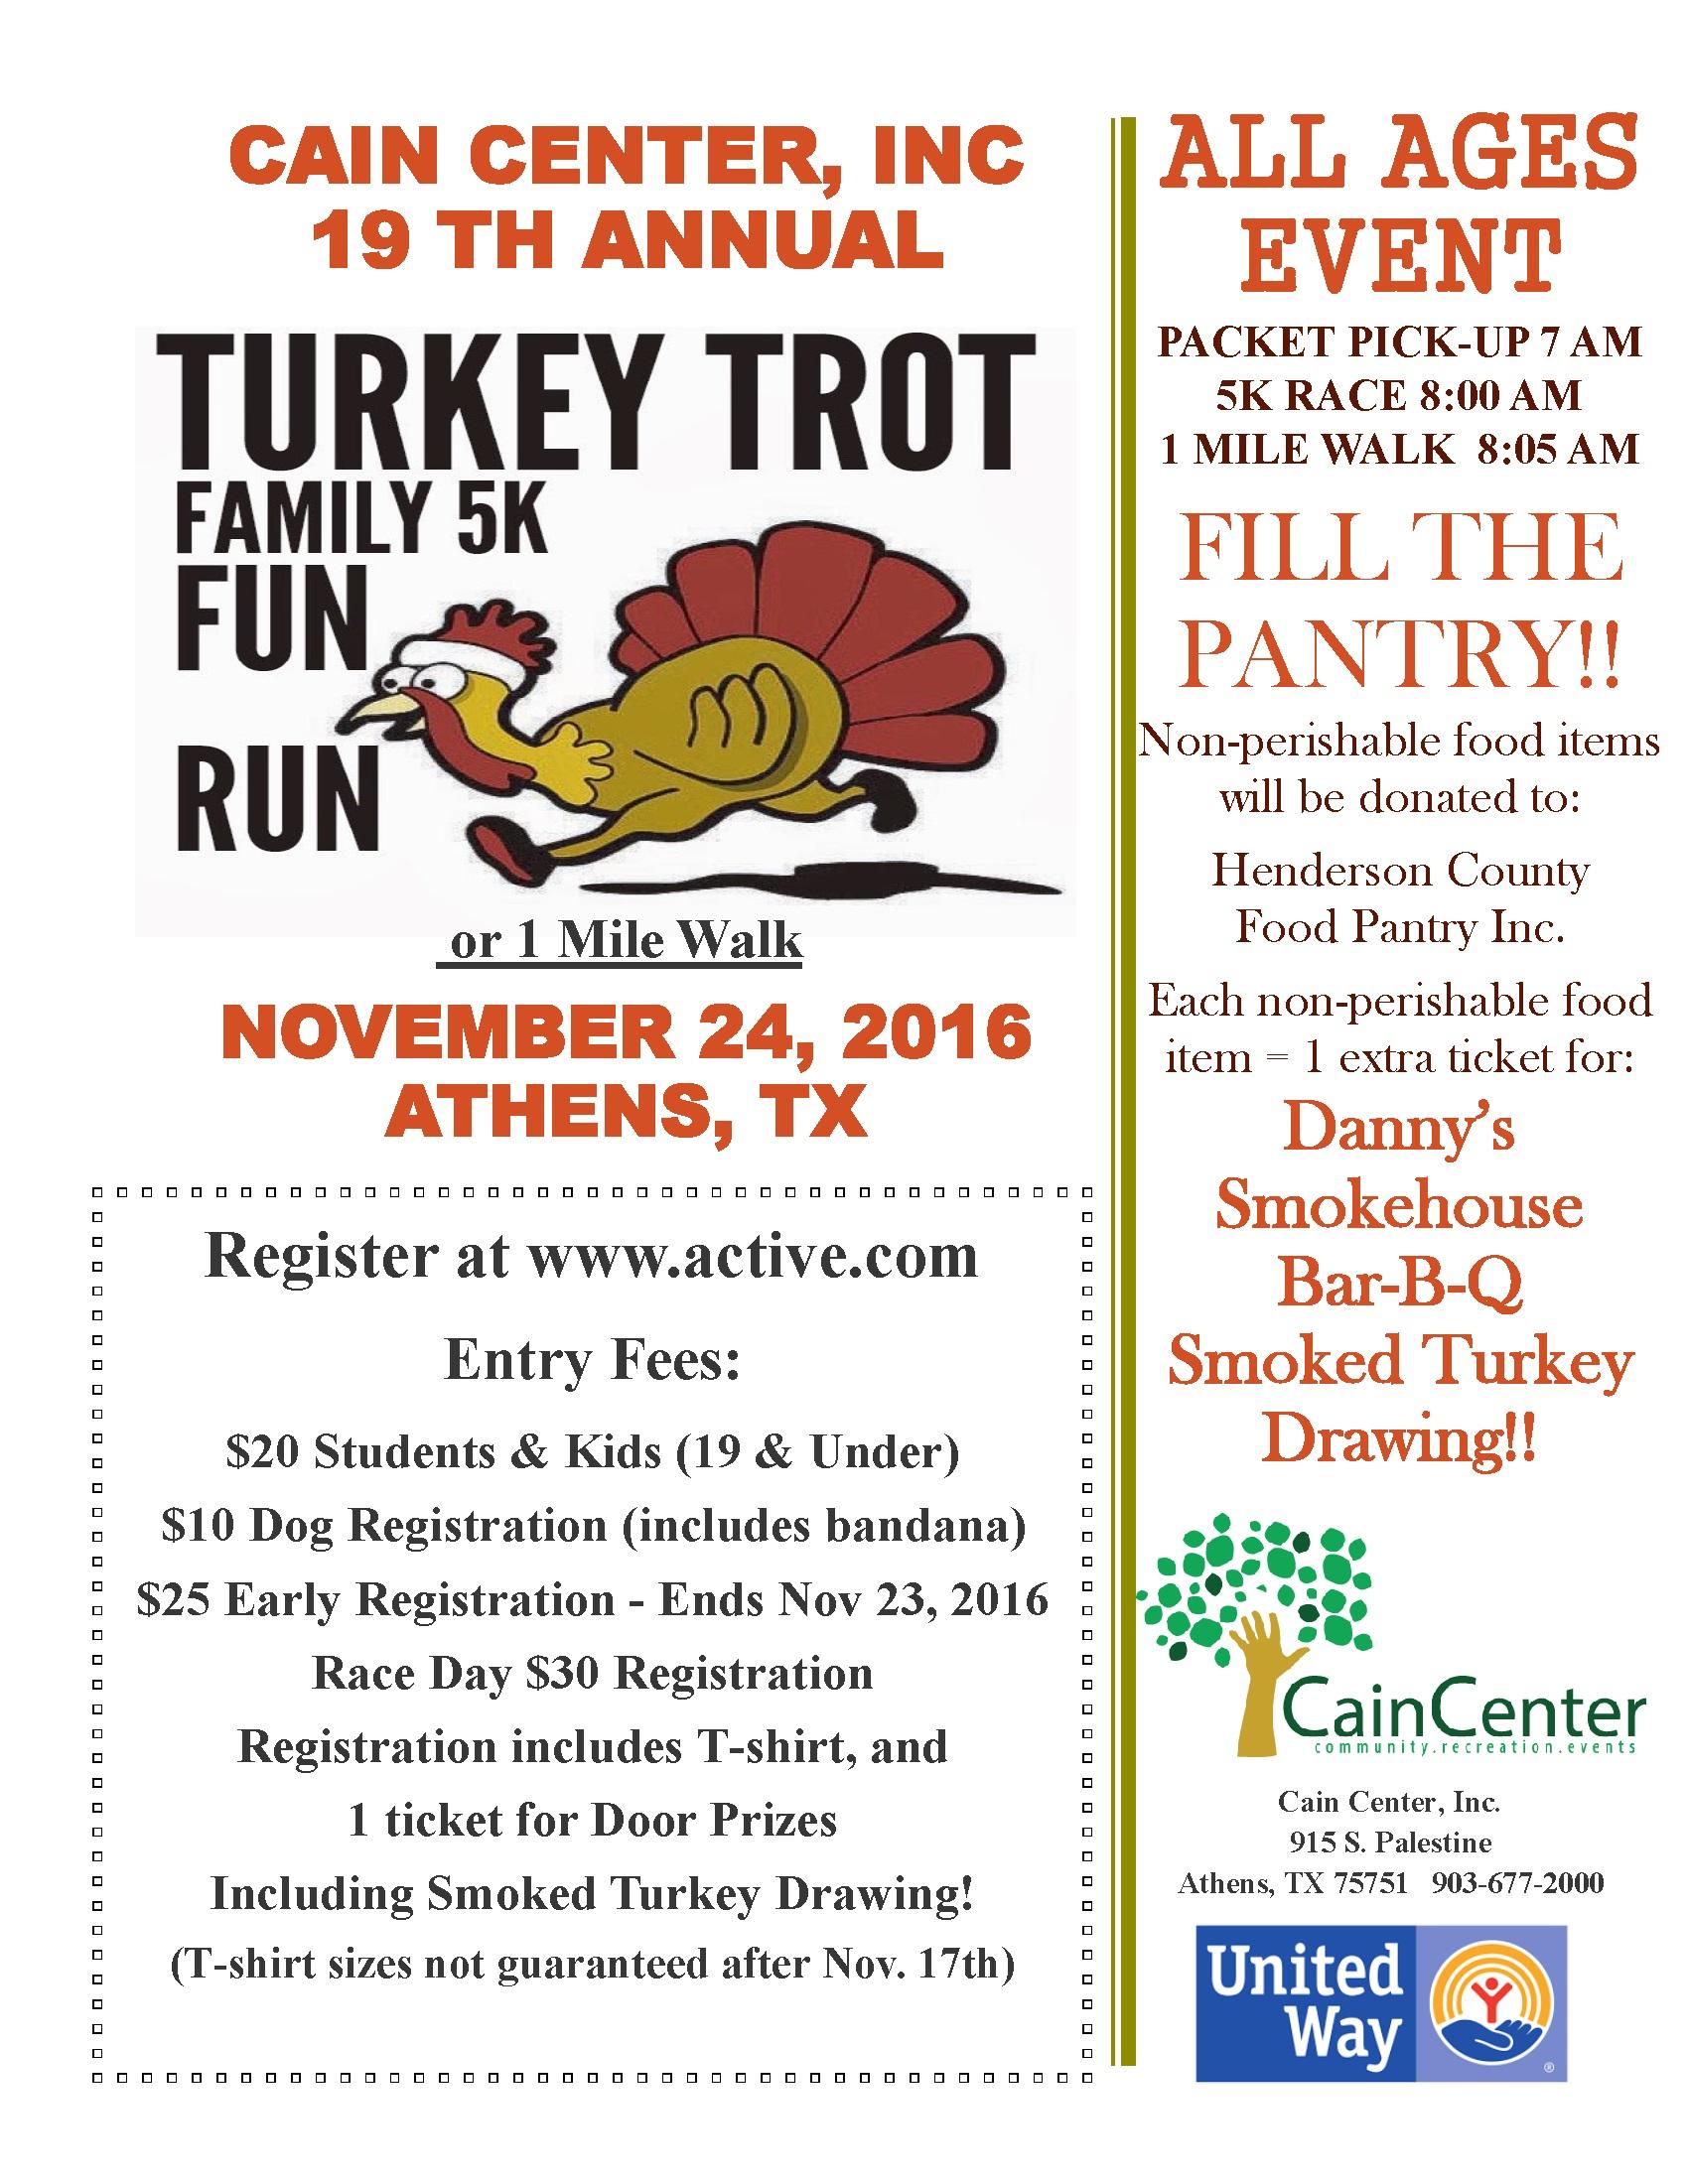 Cain Center Turkey Trot